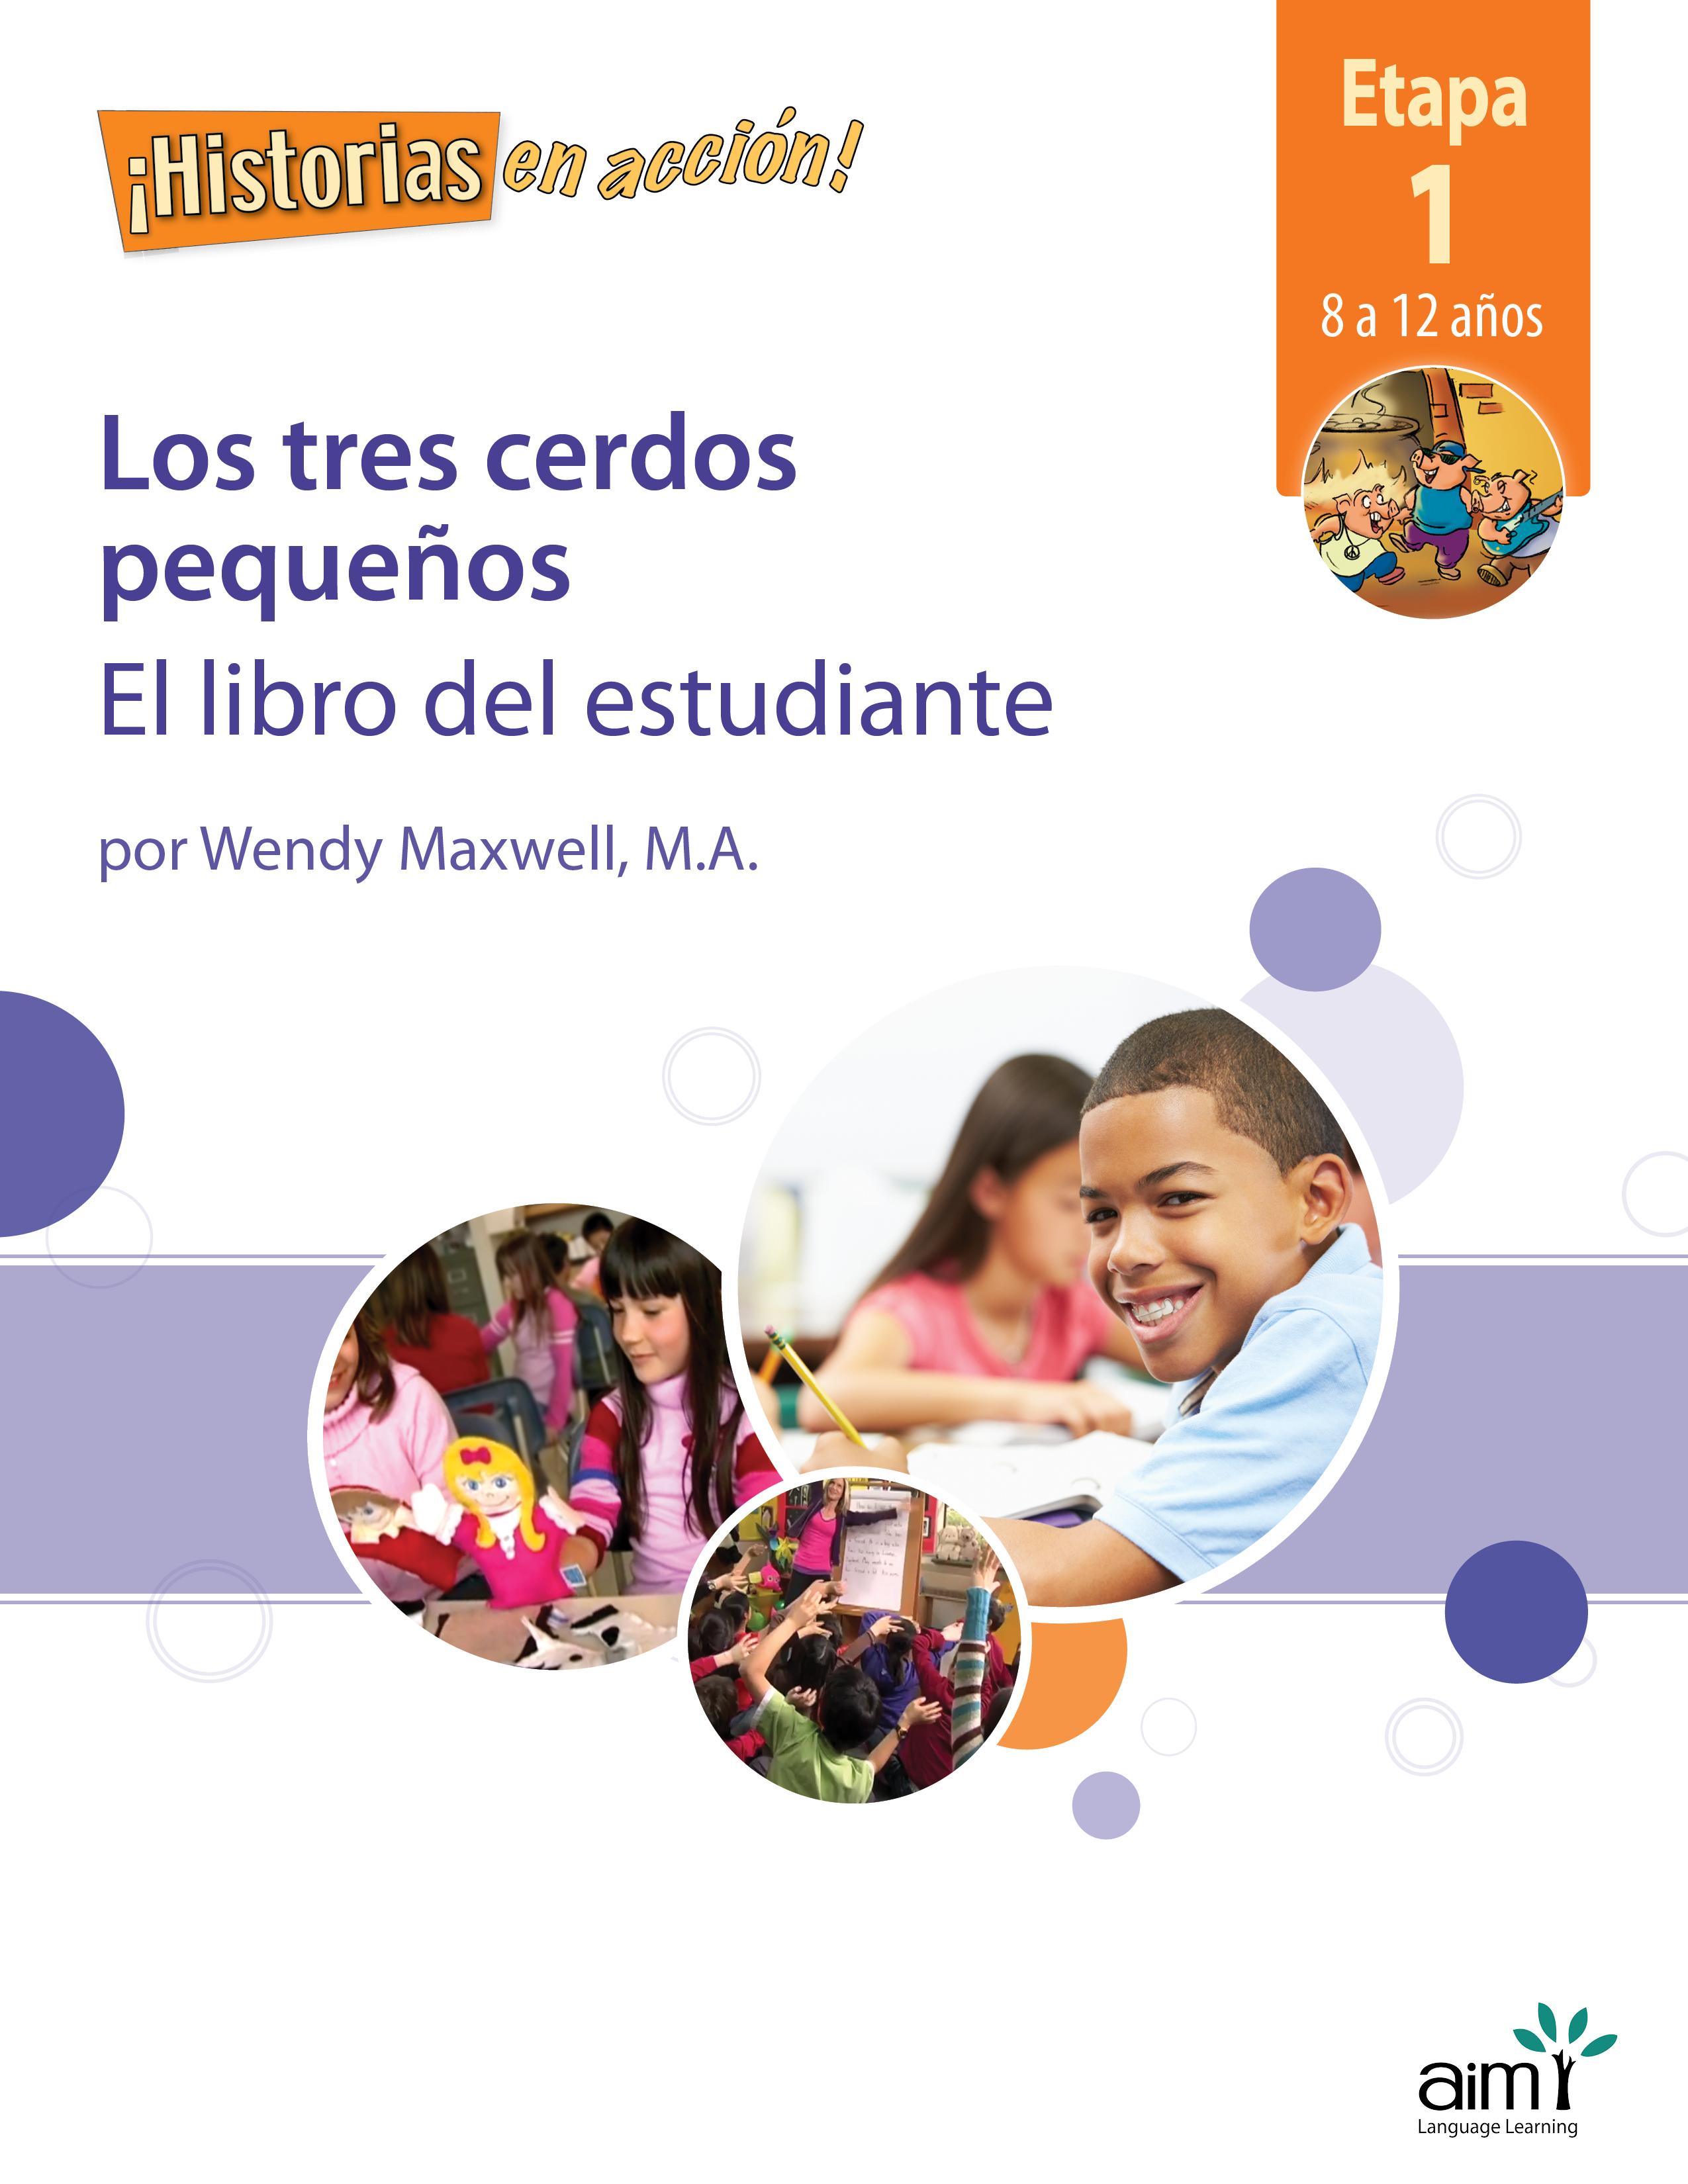 20950 SHEA 1A LOS TRES CERDOS PEQUEÑOS Student Book Cover_Prev